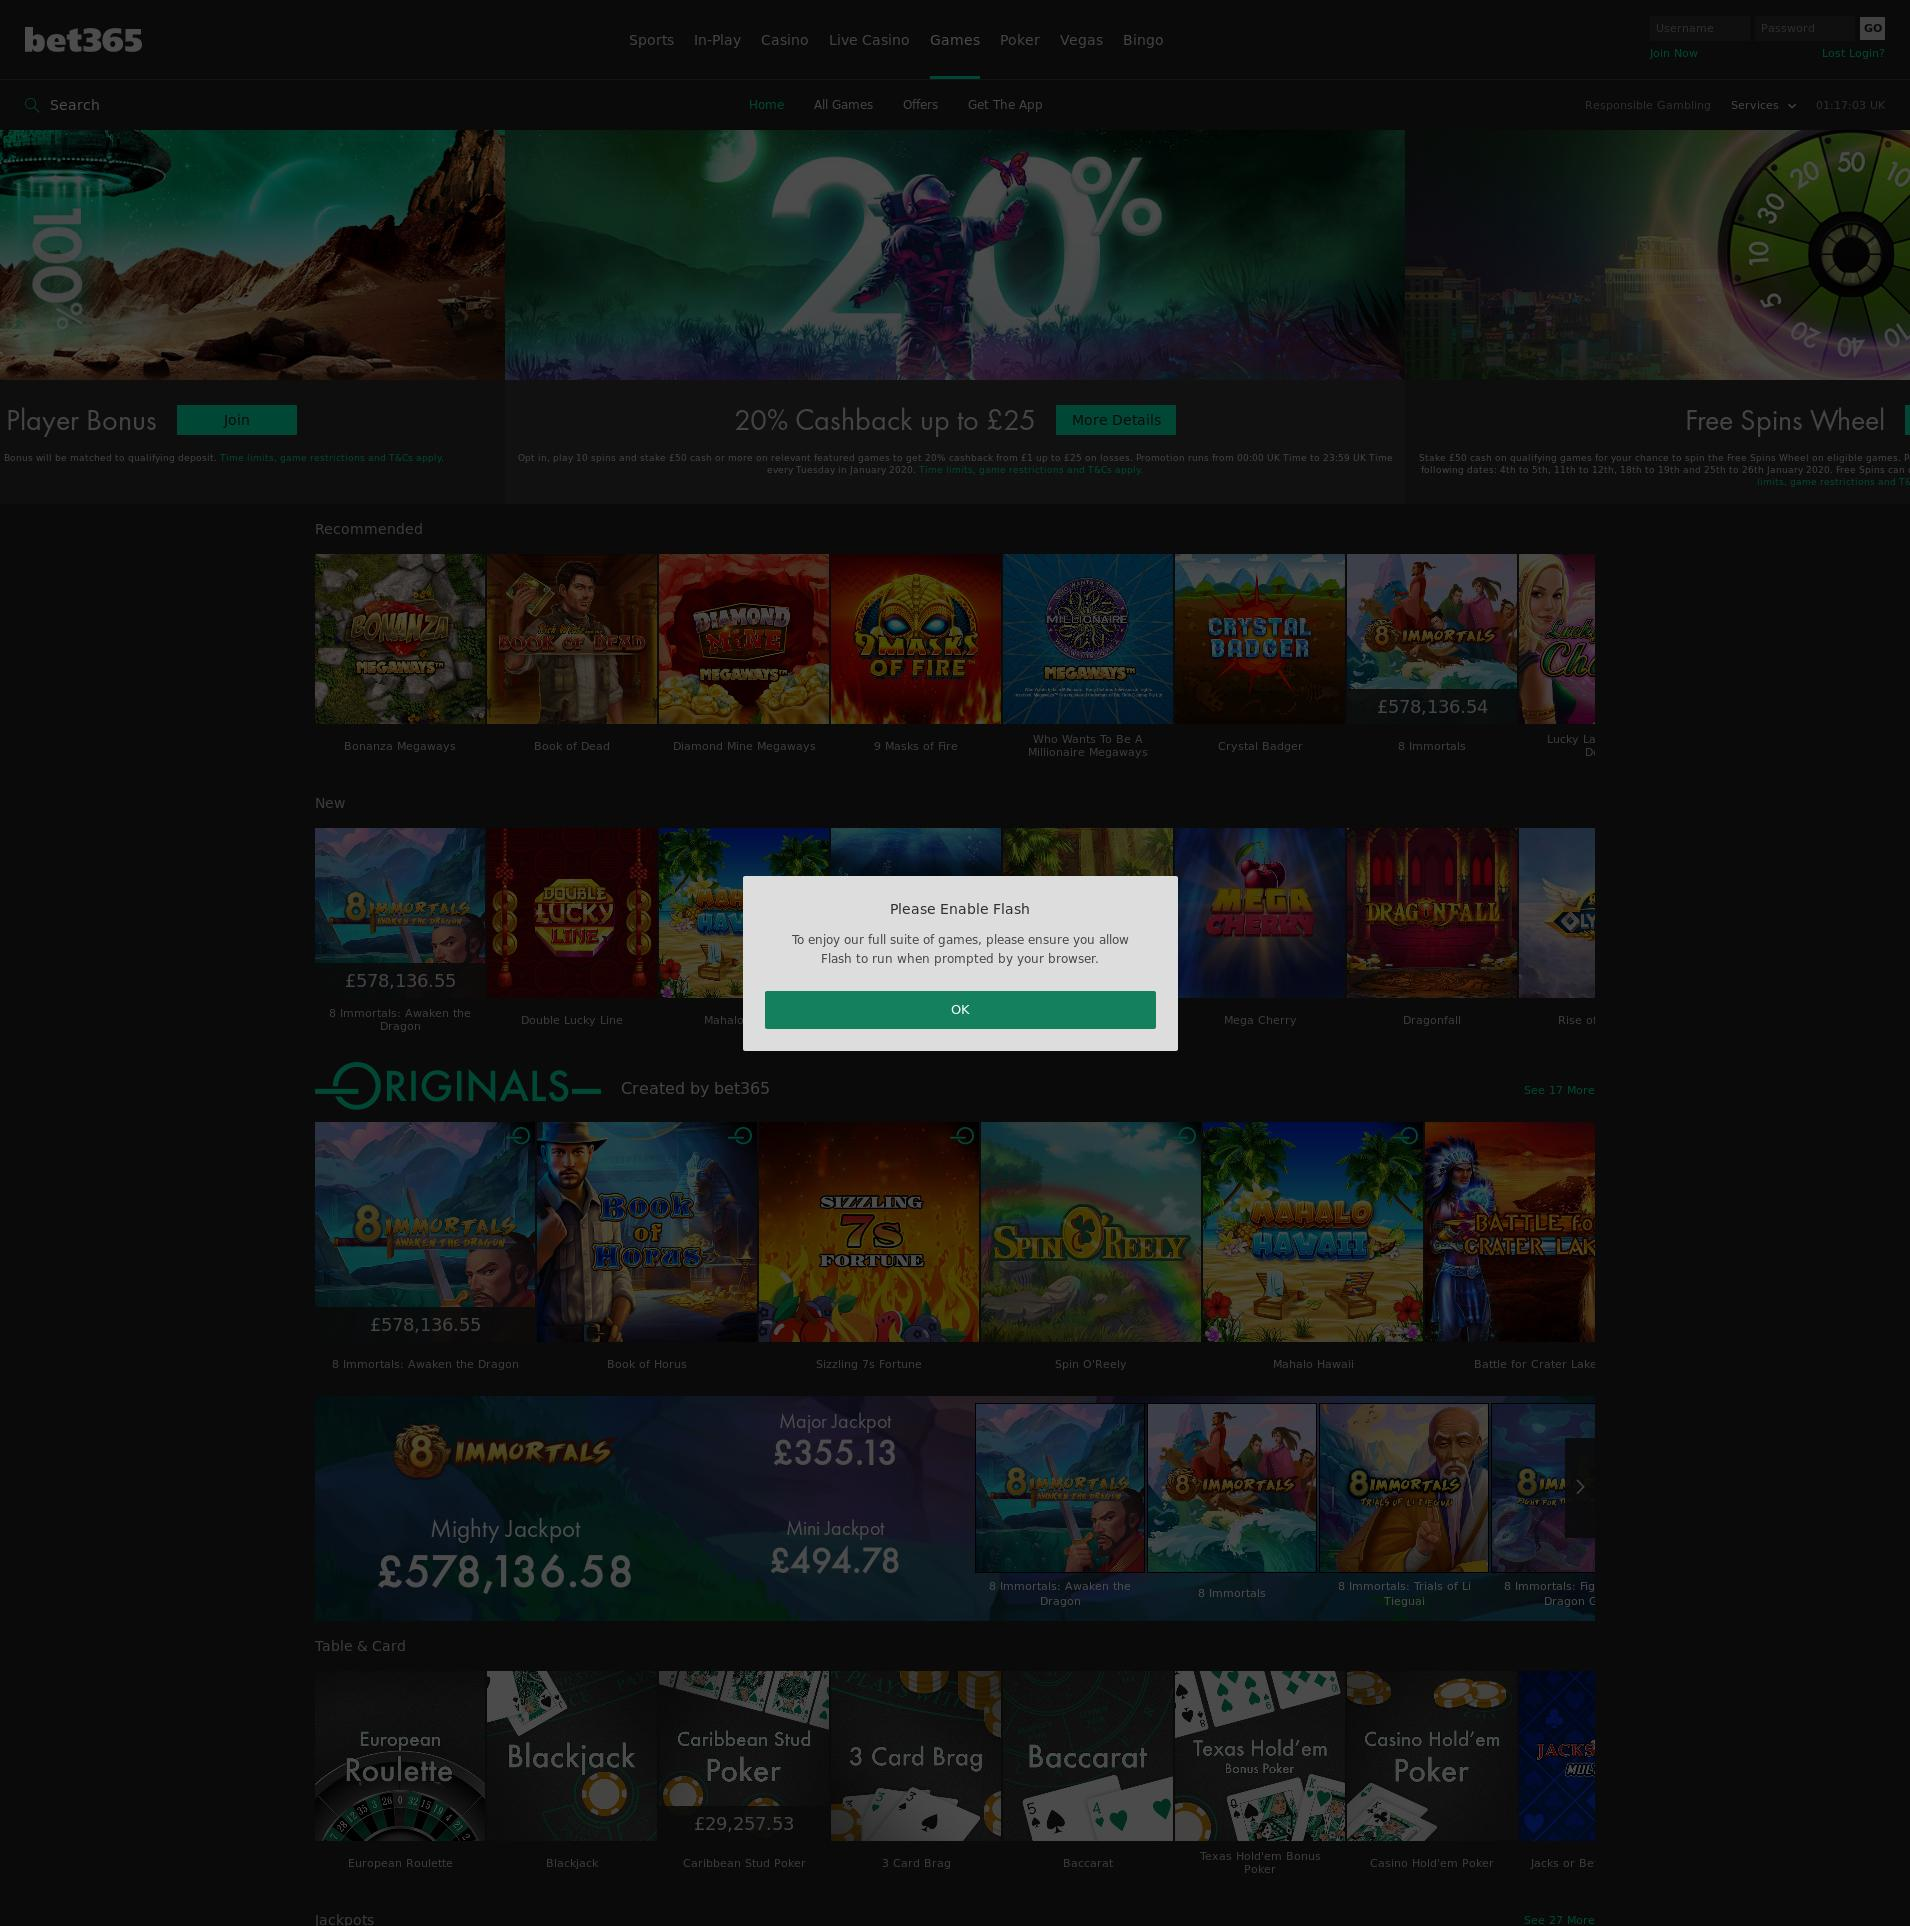 Casino screen Lobby 2020-01-17 for United Kingdom